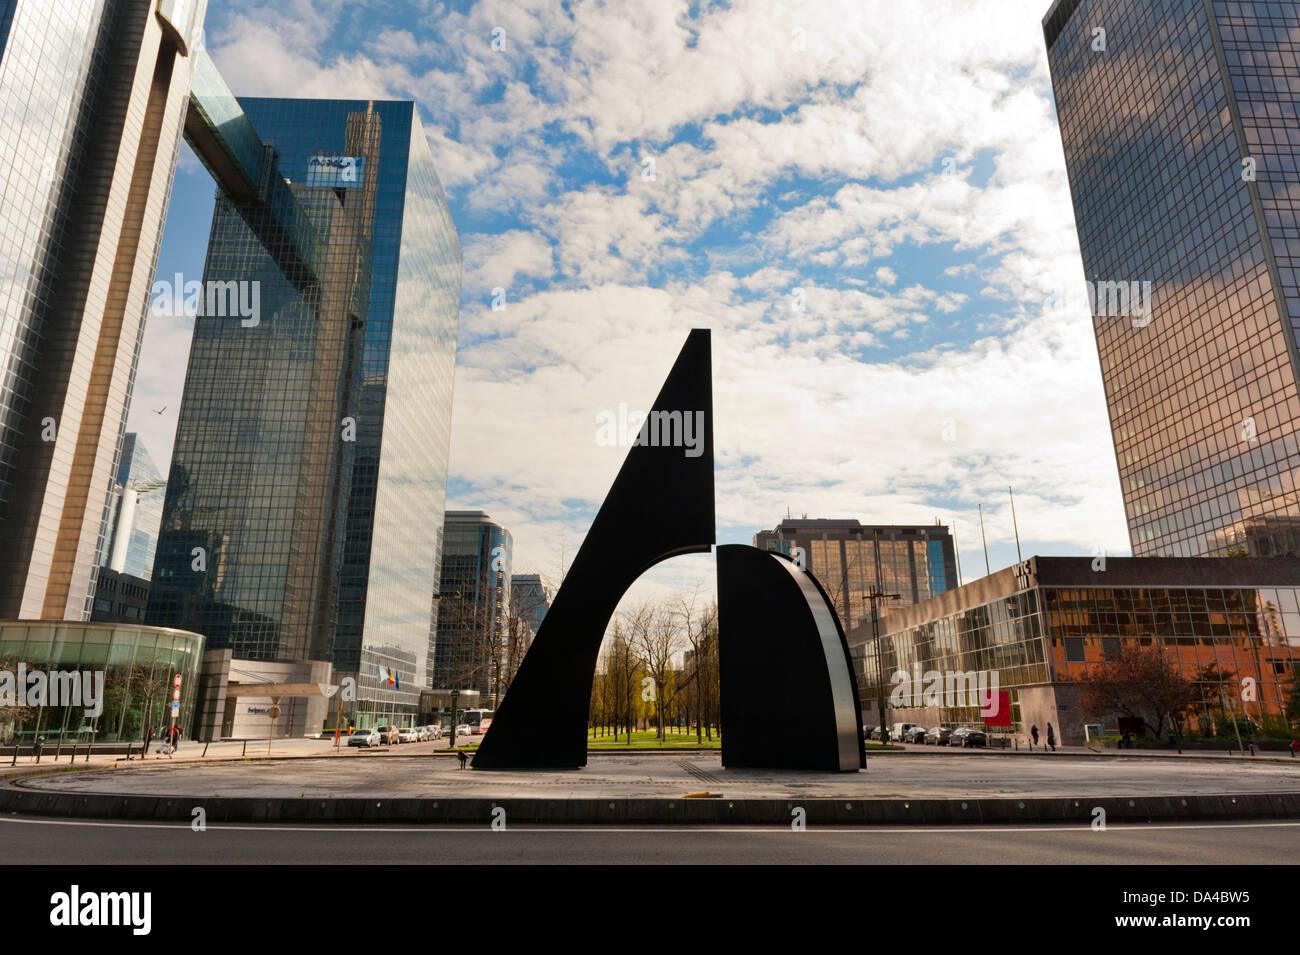 World Trade Center, Northern Quarter, the financial district of Brussels, Boulevard Simon Bolivar, Belgium. - Stock Image